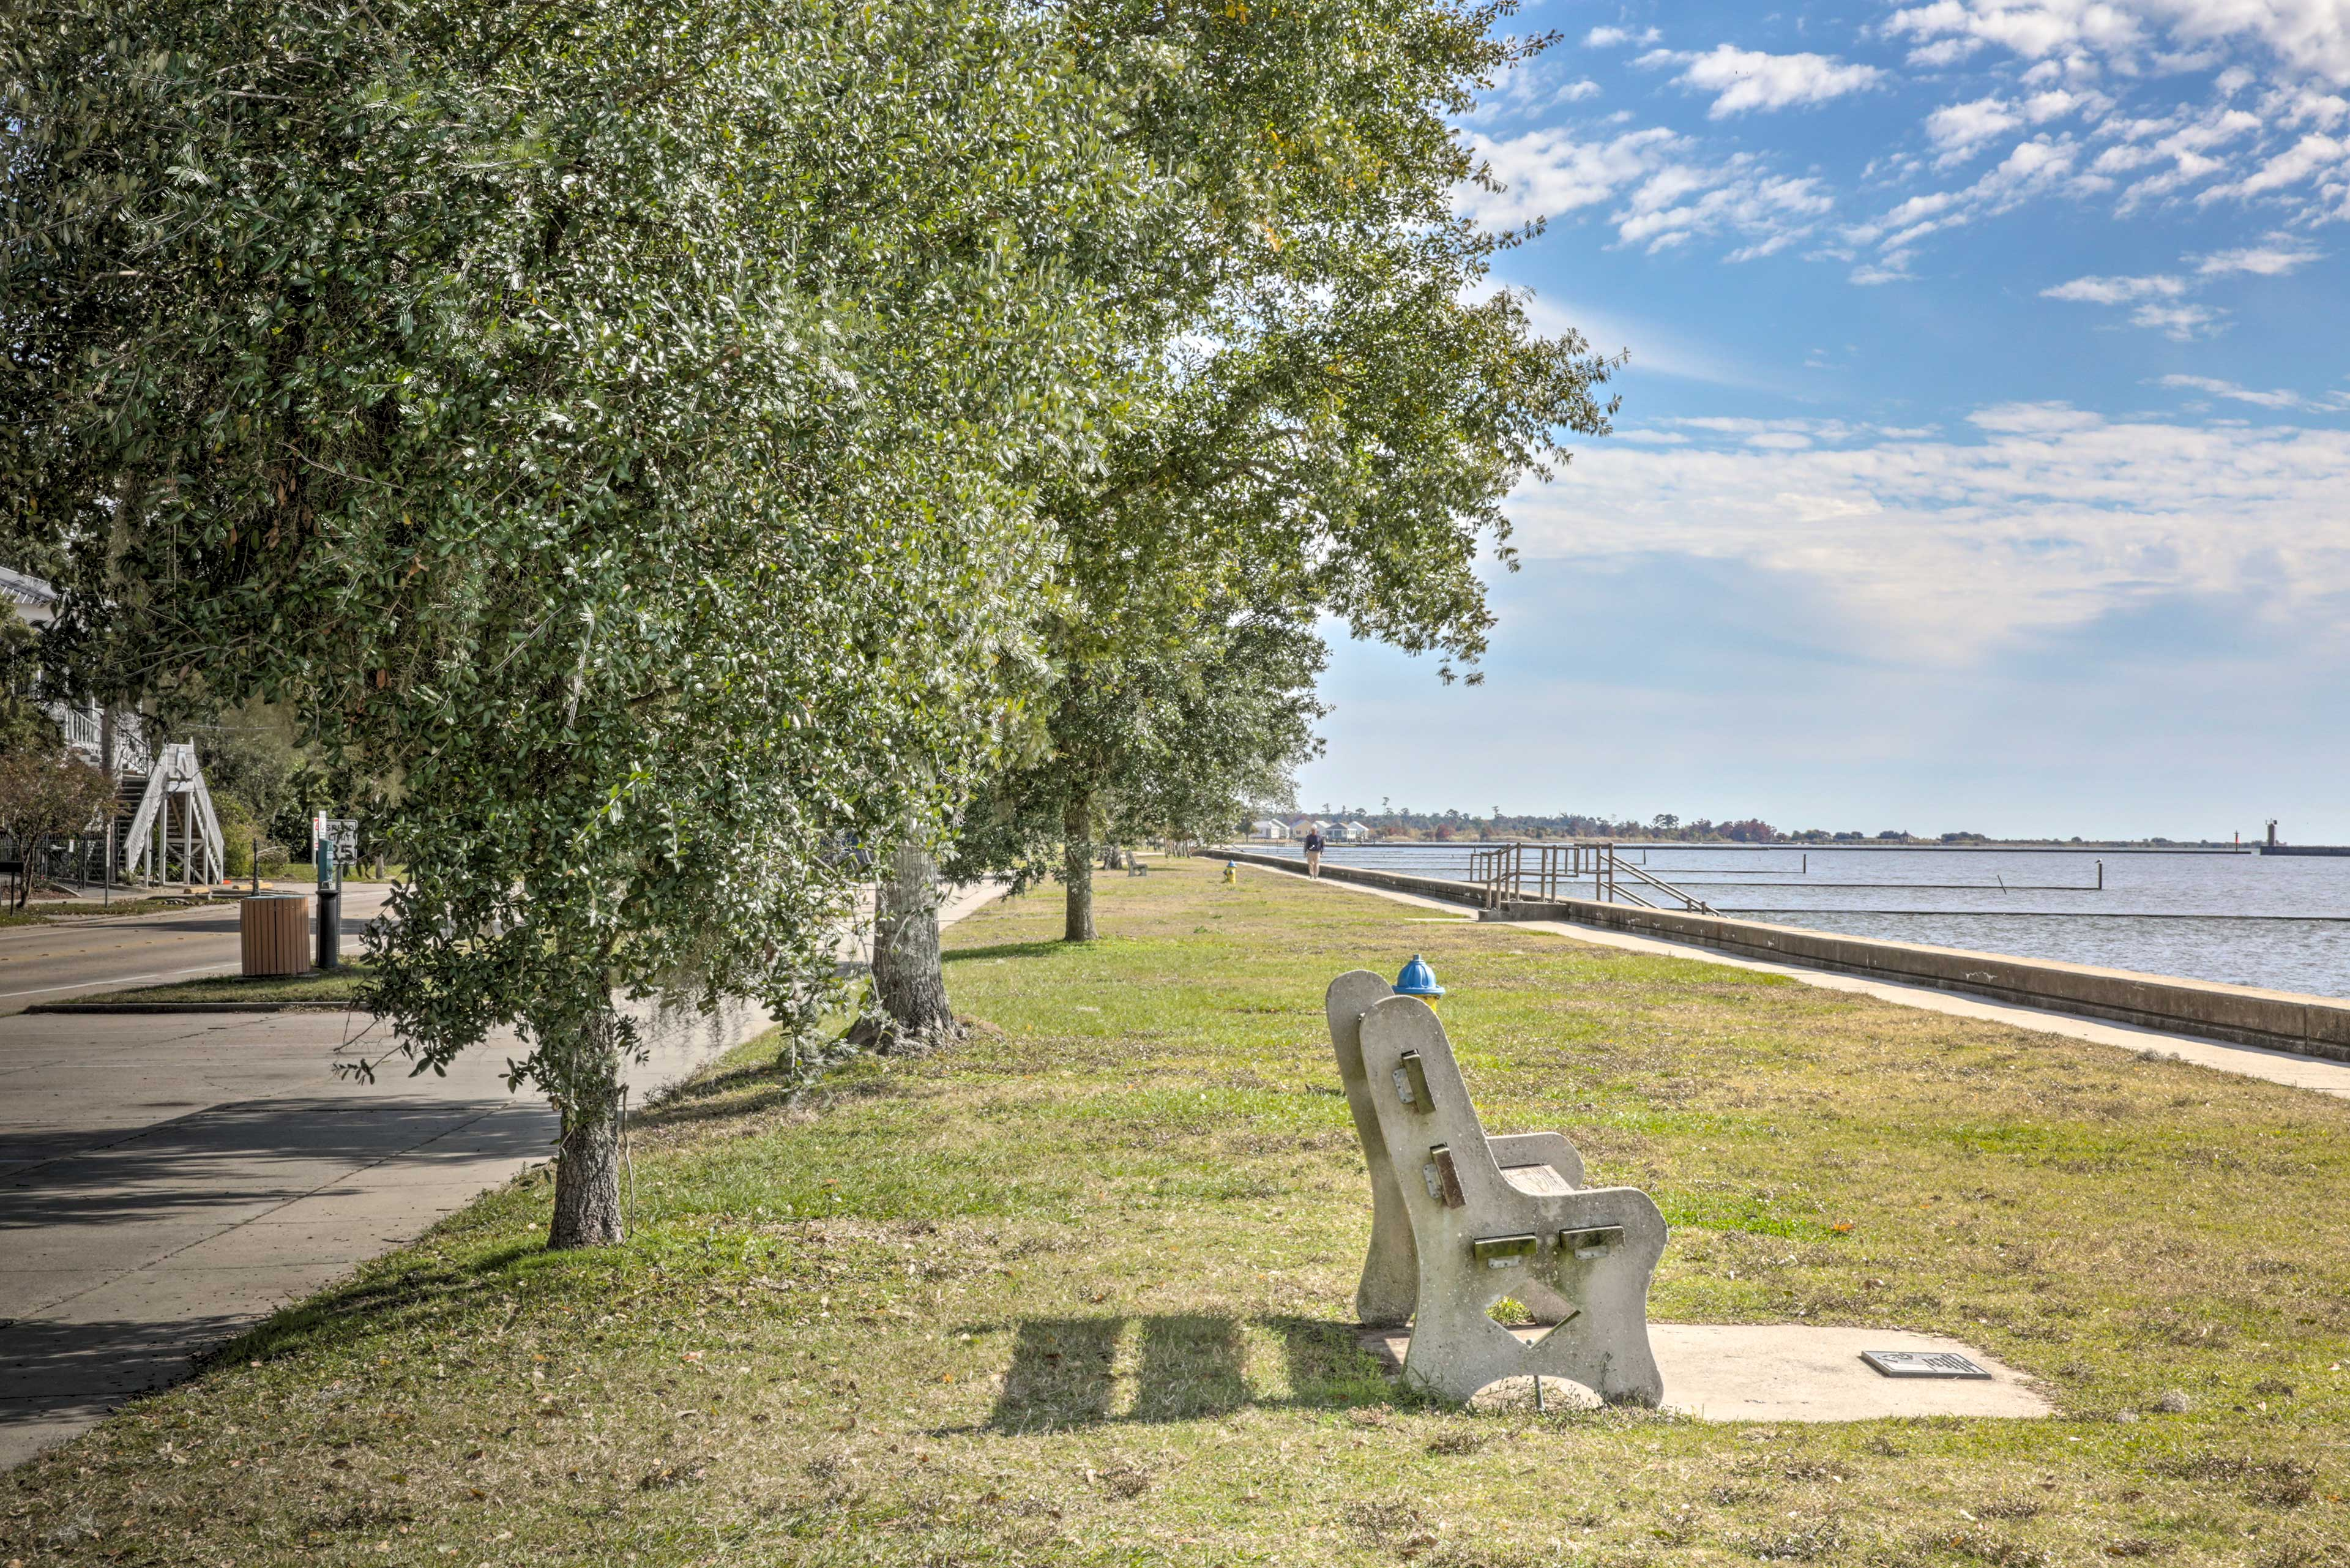 Walk just 2 blocks to reach the serene North Shore of Lake Pontchartrain.